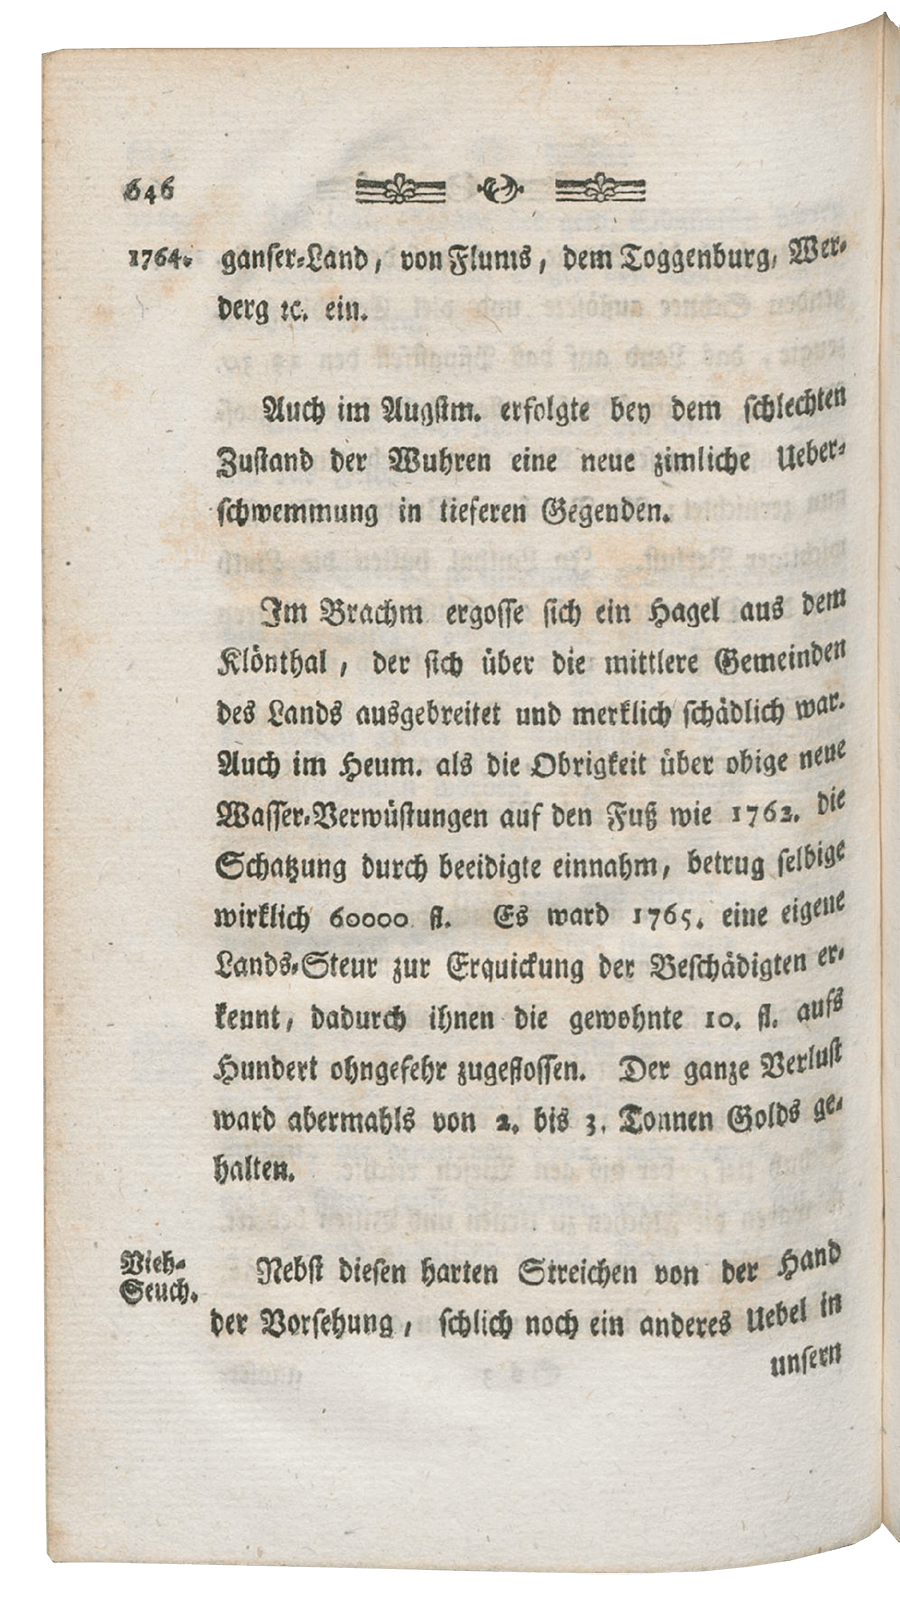 1764_1774_TrÅmpi_Glarner-Chronick_644-646-3